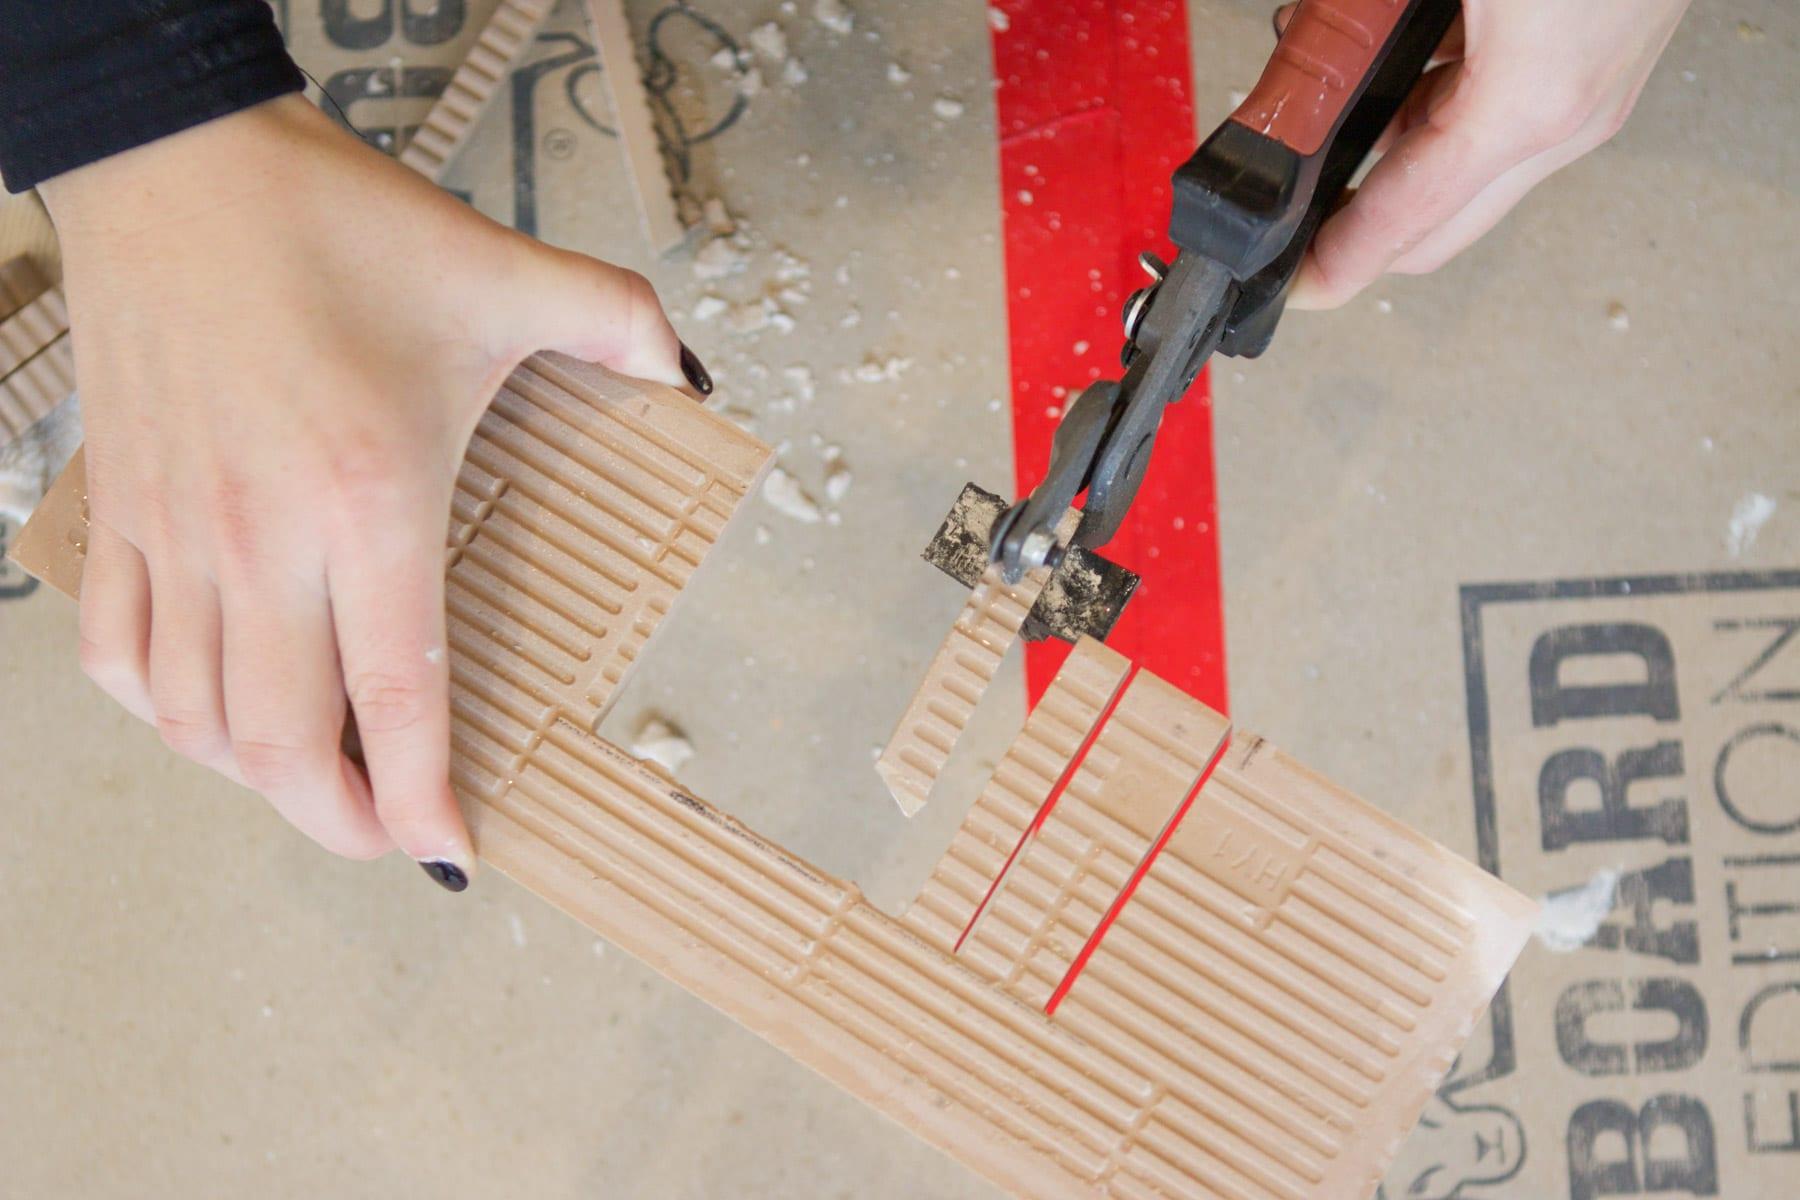 - How To Install Backsplash Tile The DIY Playbook